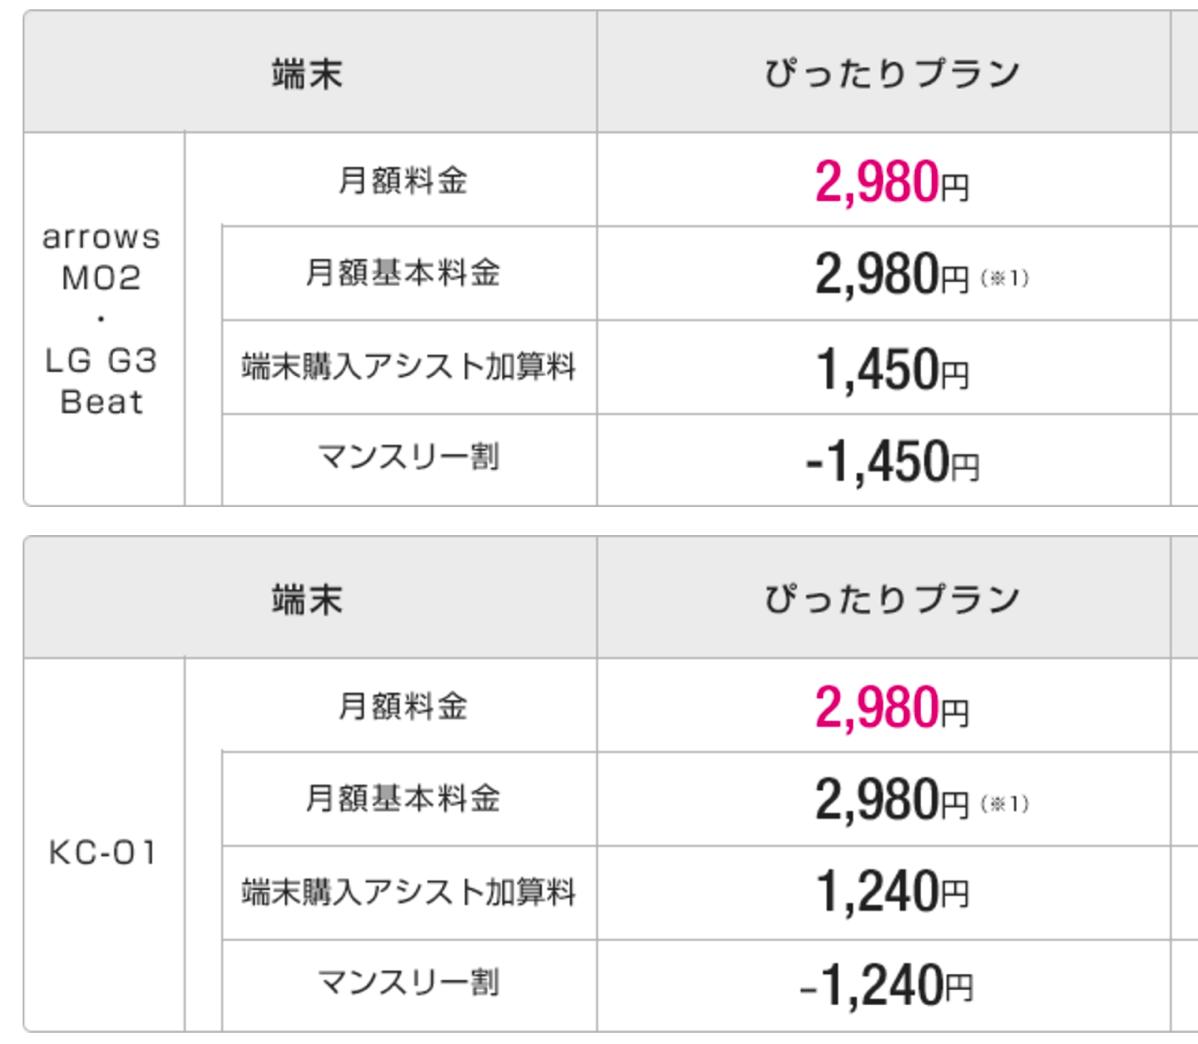 UQ、旅行券5万円分やUQ mobile対応のZenPad 7.0があたるキャンペーン開催!UQサービス契約者以外も応募ok